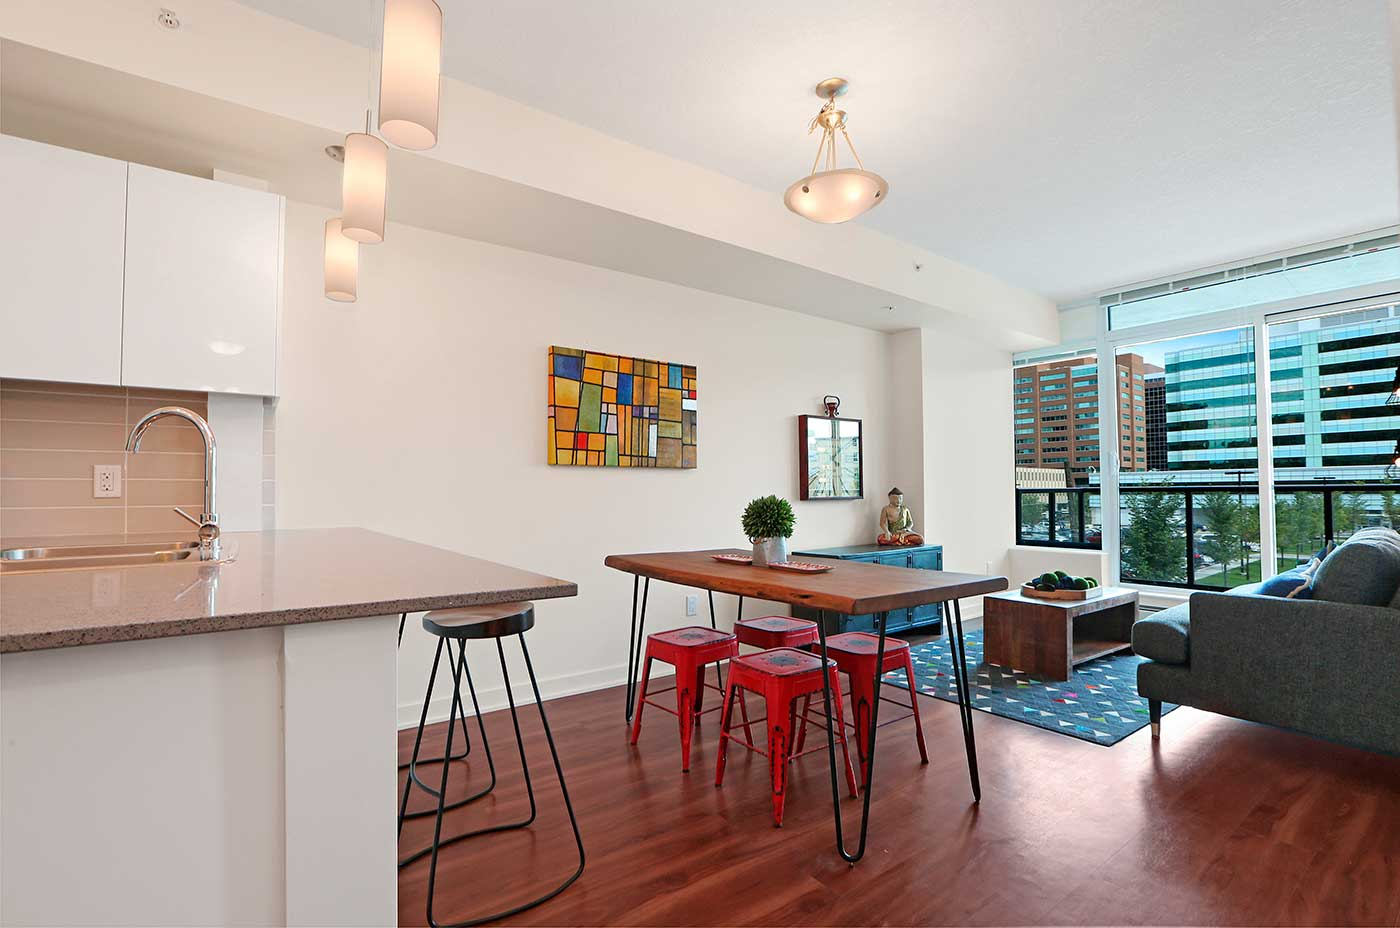 1215 Rental Apartments - One bedroom F2 Livingroom view